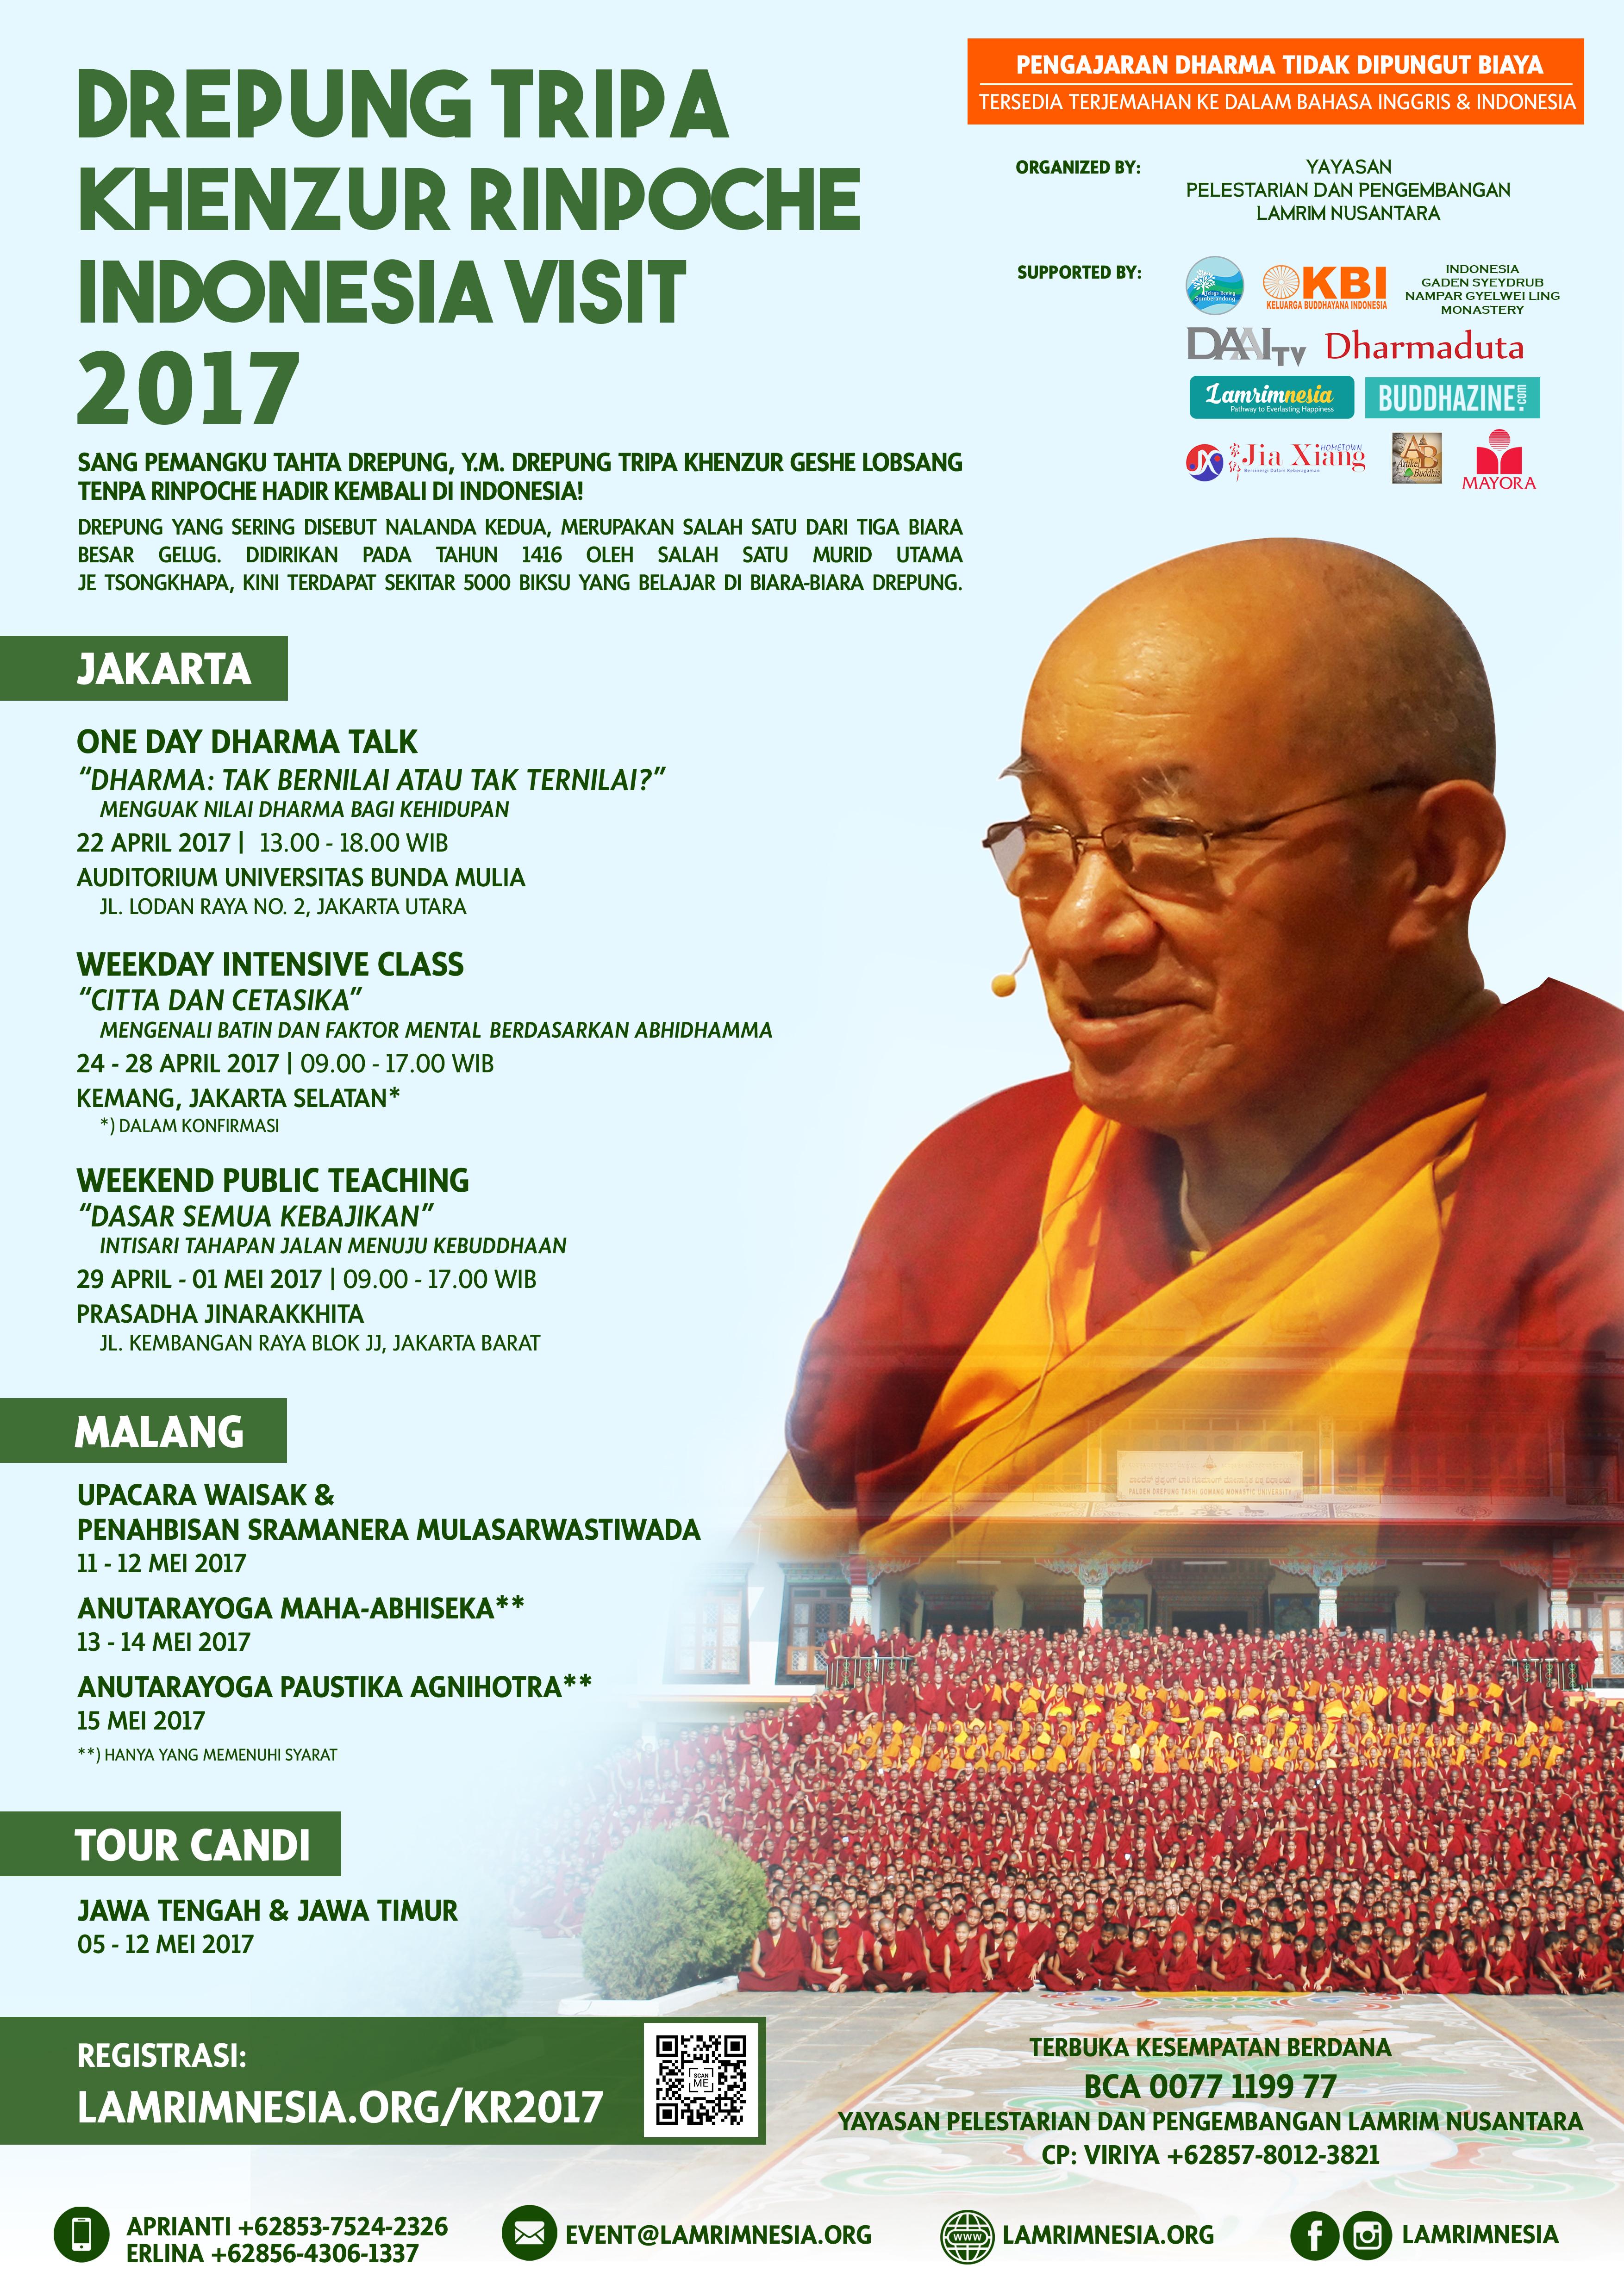 Drepung Tripa Khenzur Rinpoche Indonesia Visit 2017